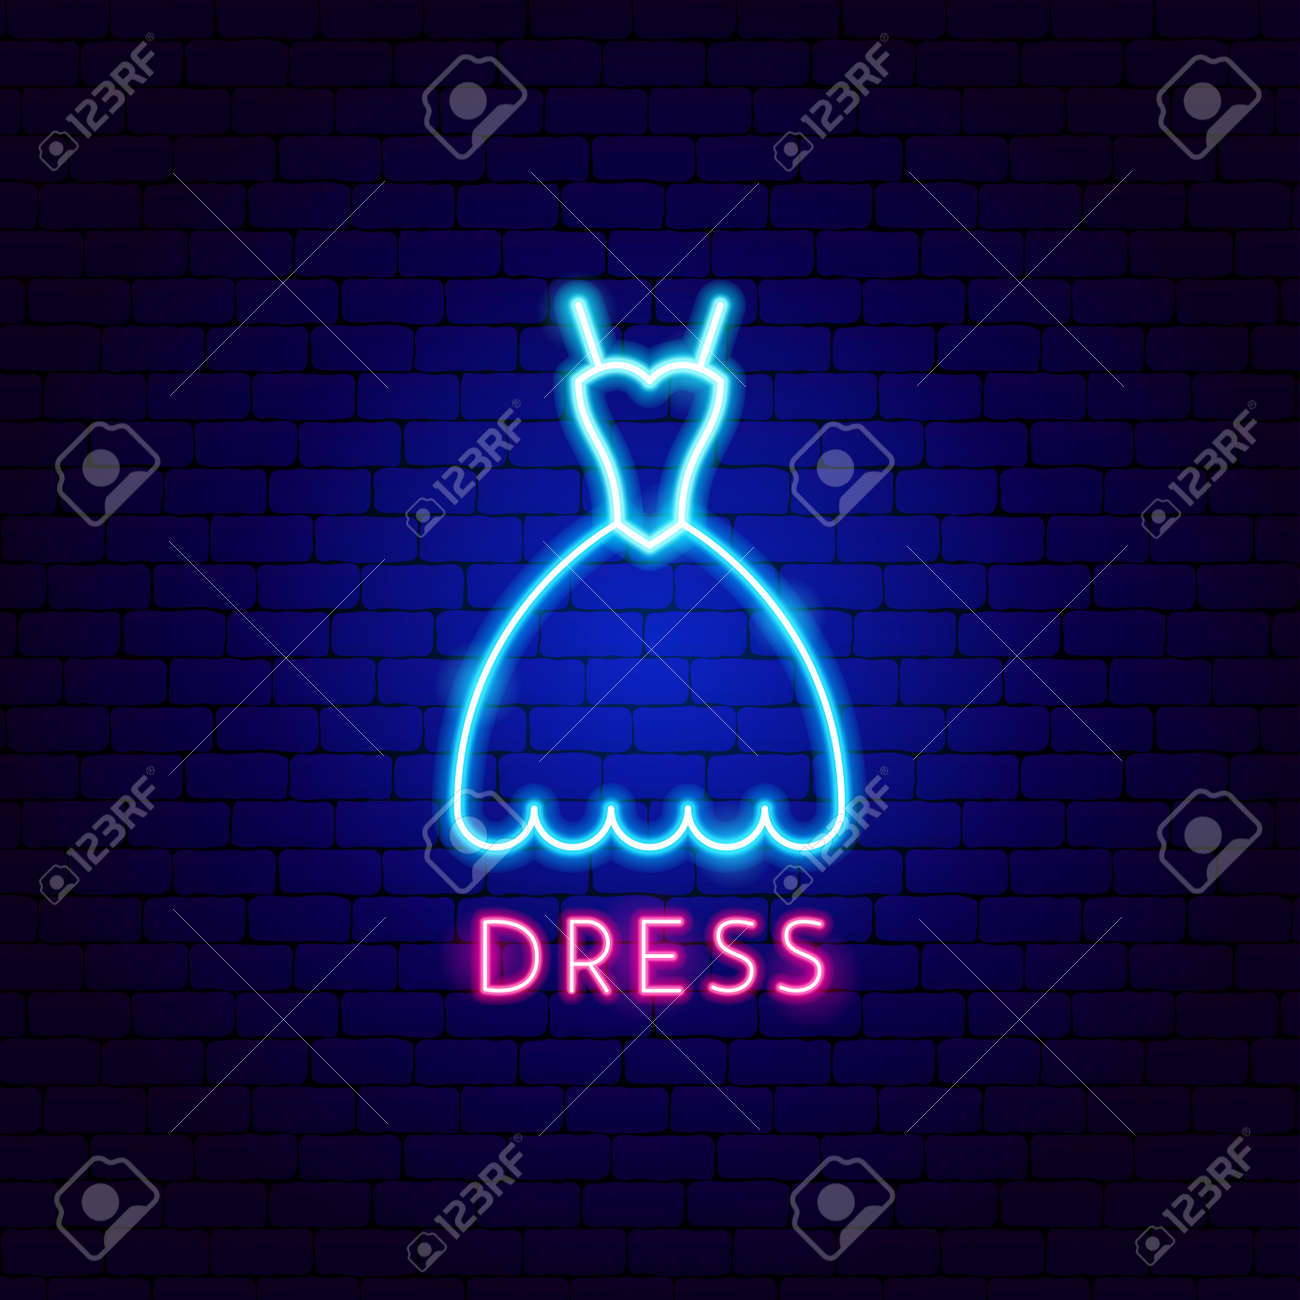 Dress Neon Label - 168963333